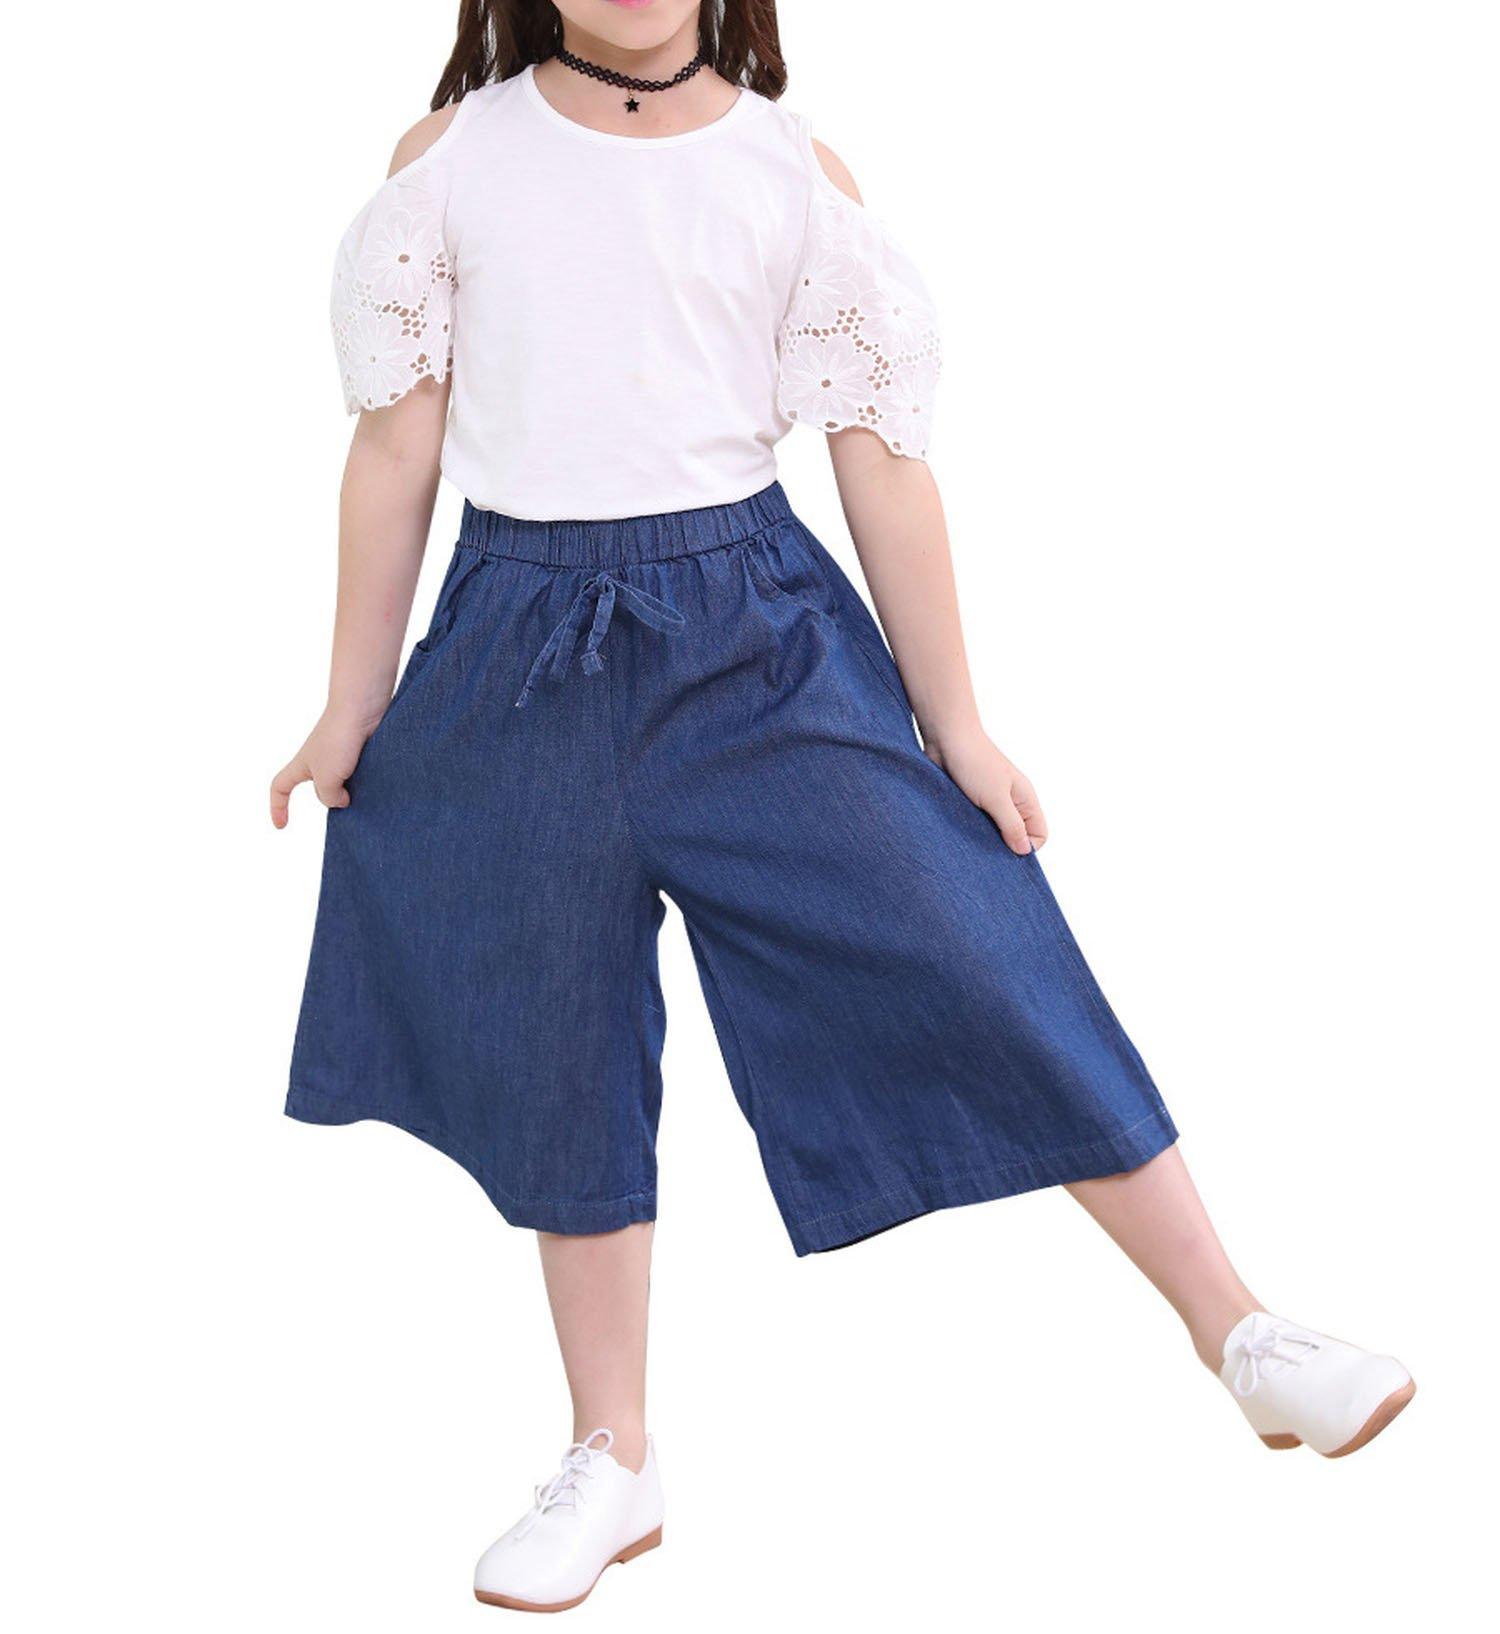 Zcaosma Girl Clothes Two-Piece Set Short Sleeve Tops Denim Pants Cotton Outfits,Beige,12